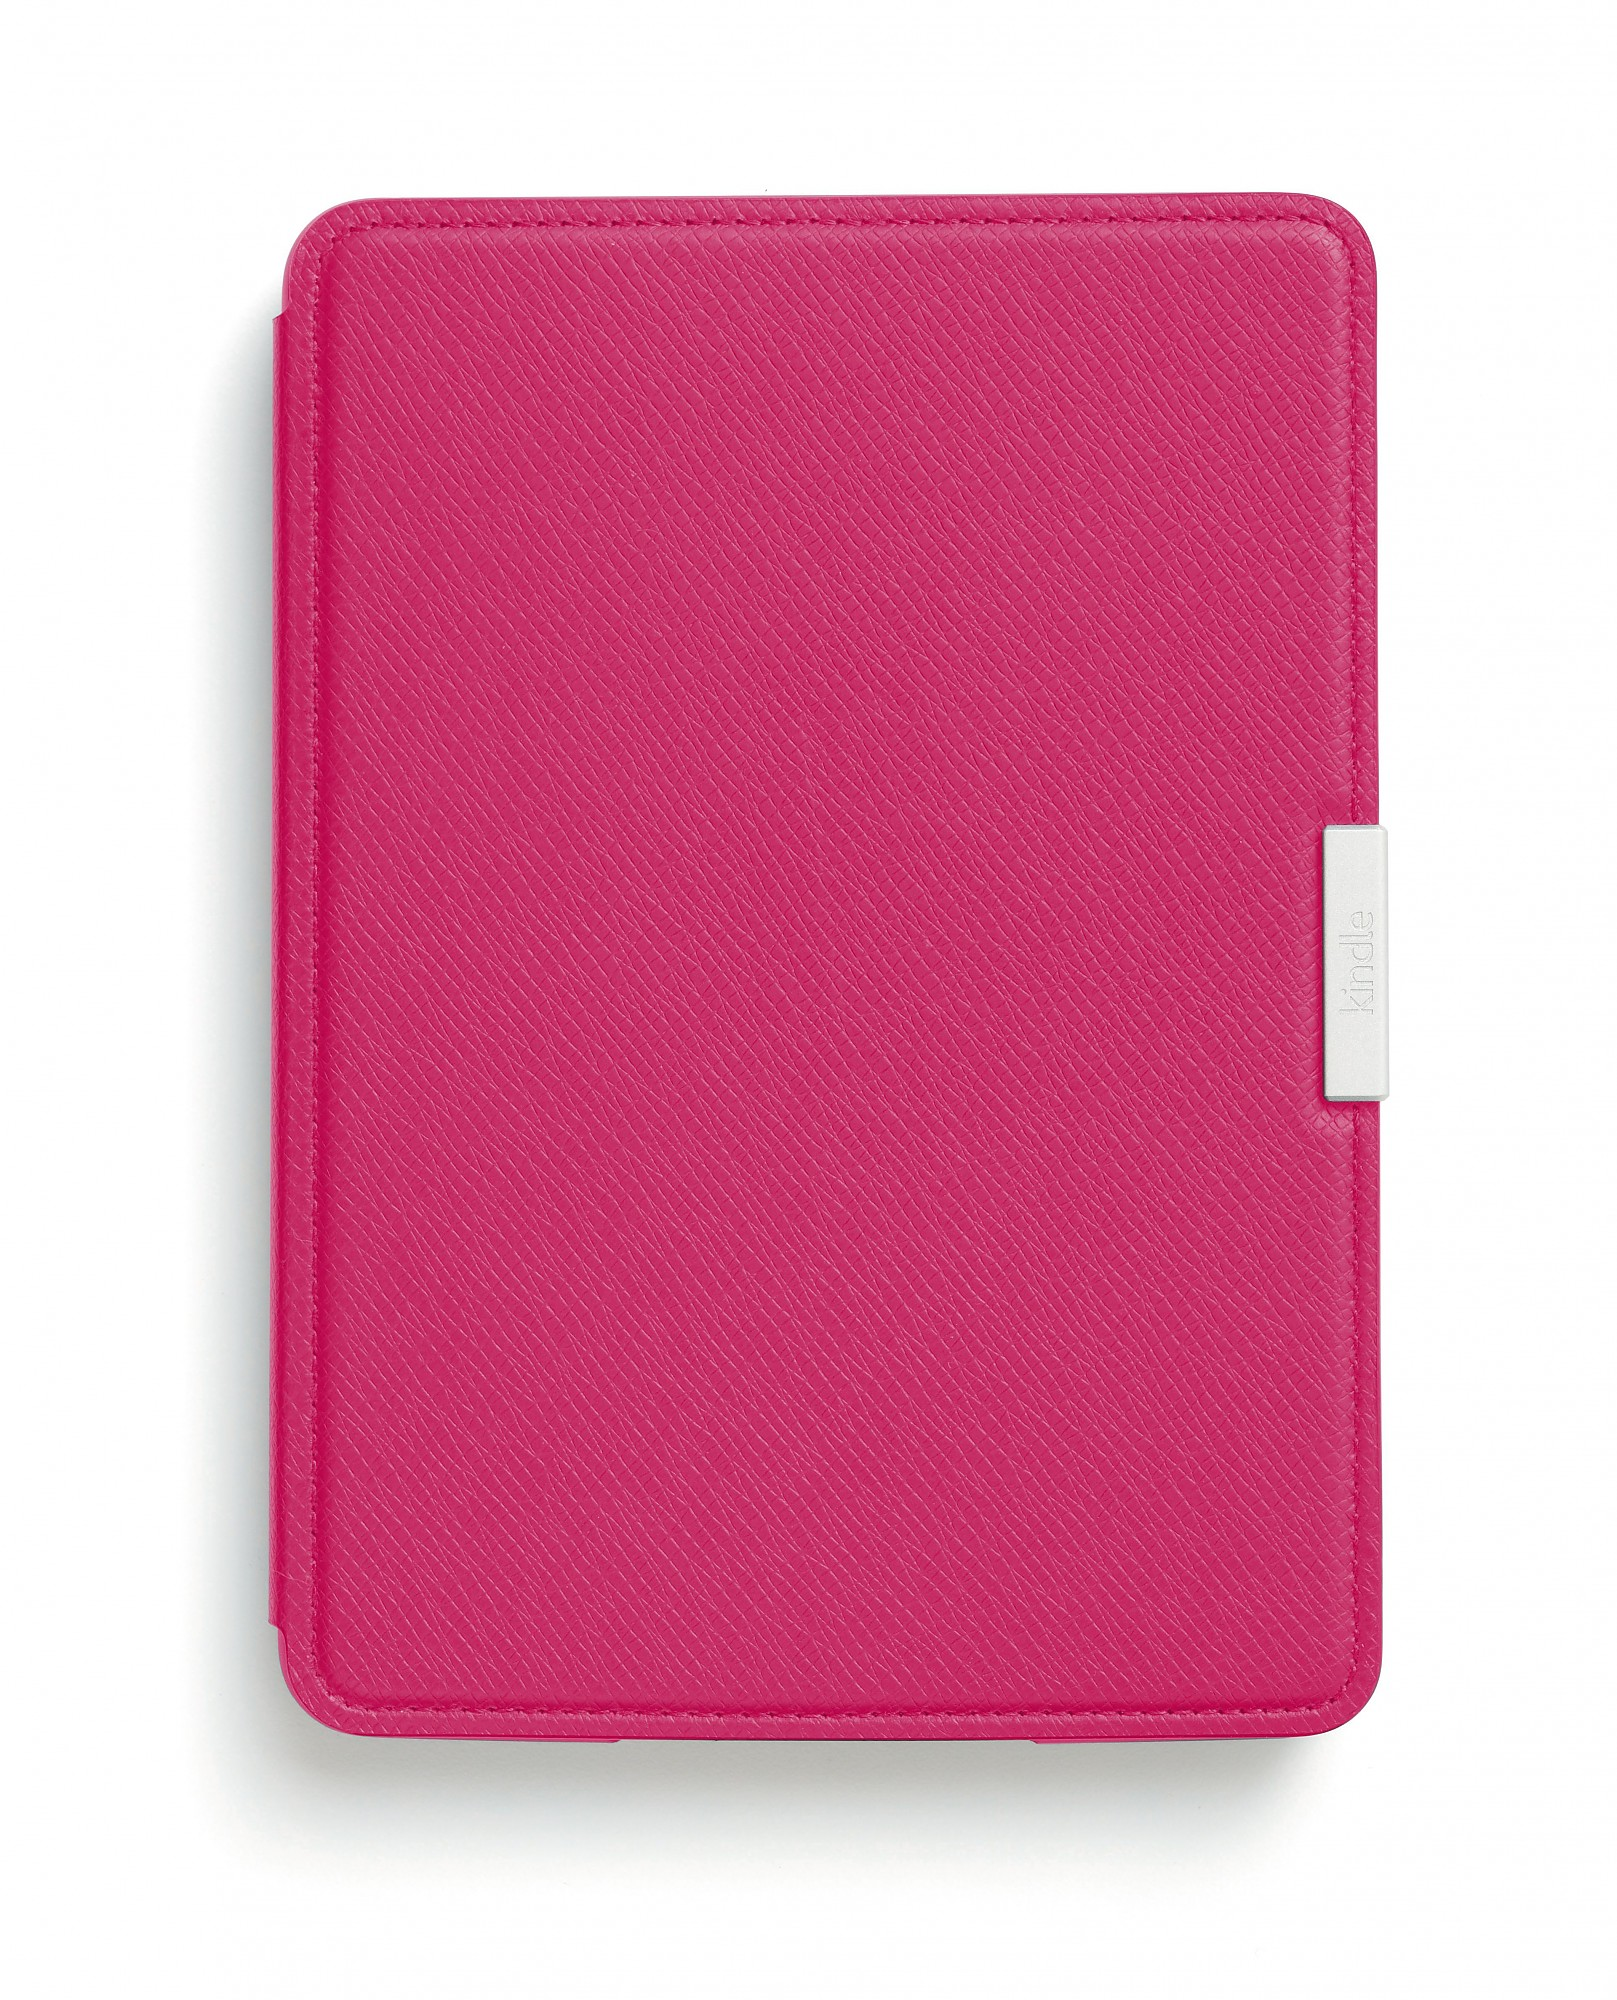 Kindle Paperwhite Book Cover Art : Pocketbike paperwhite cover fuchsia kindle